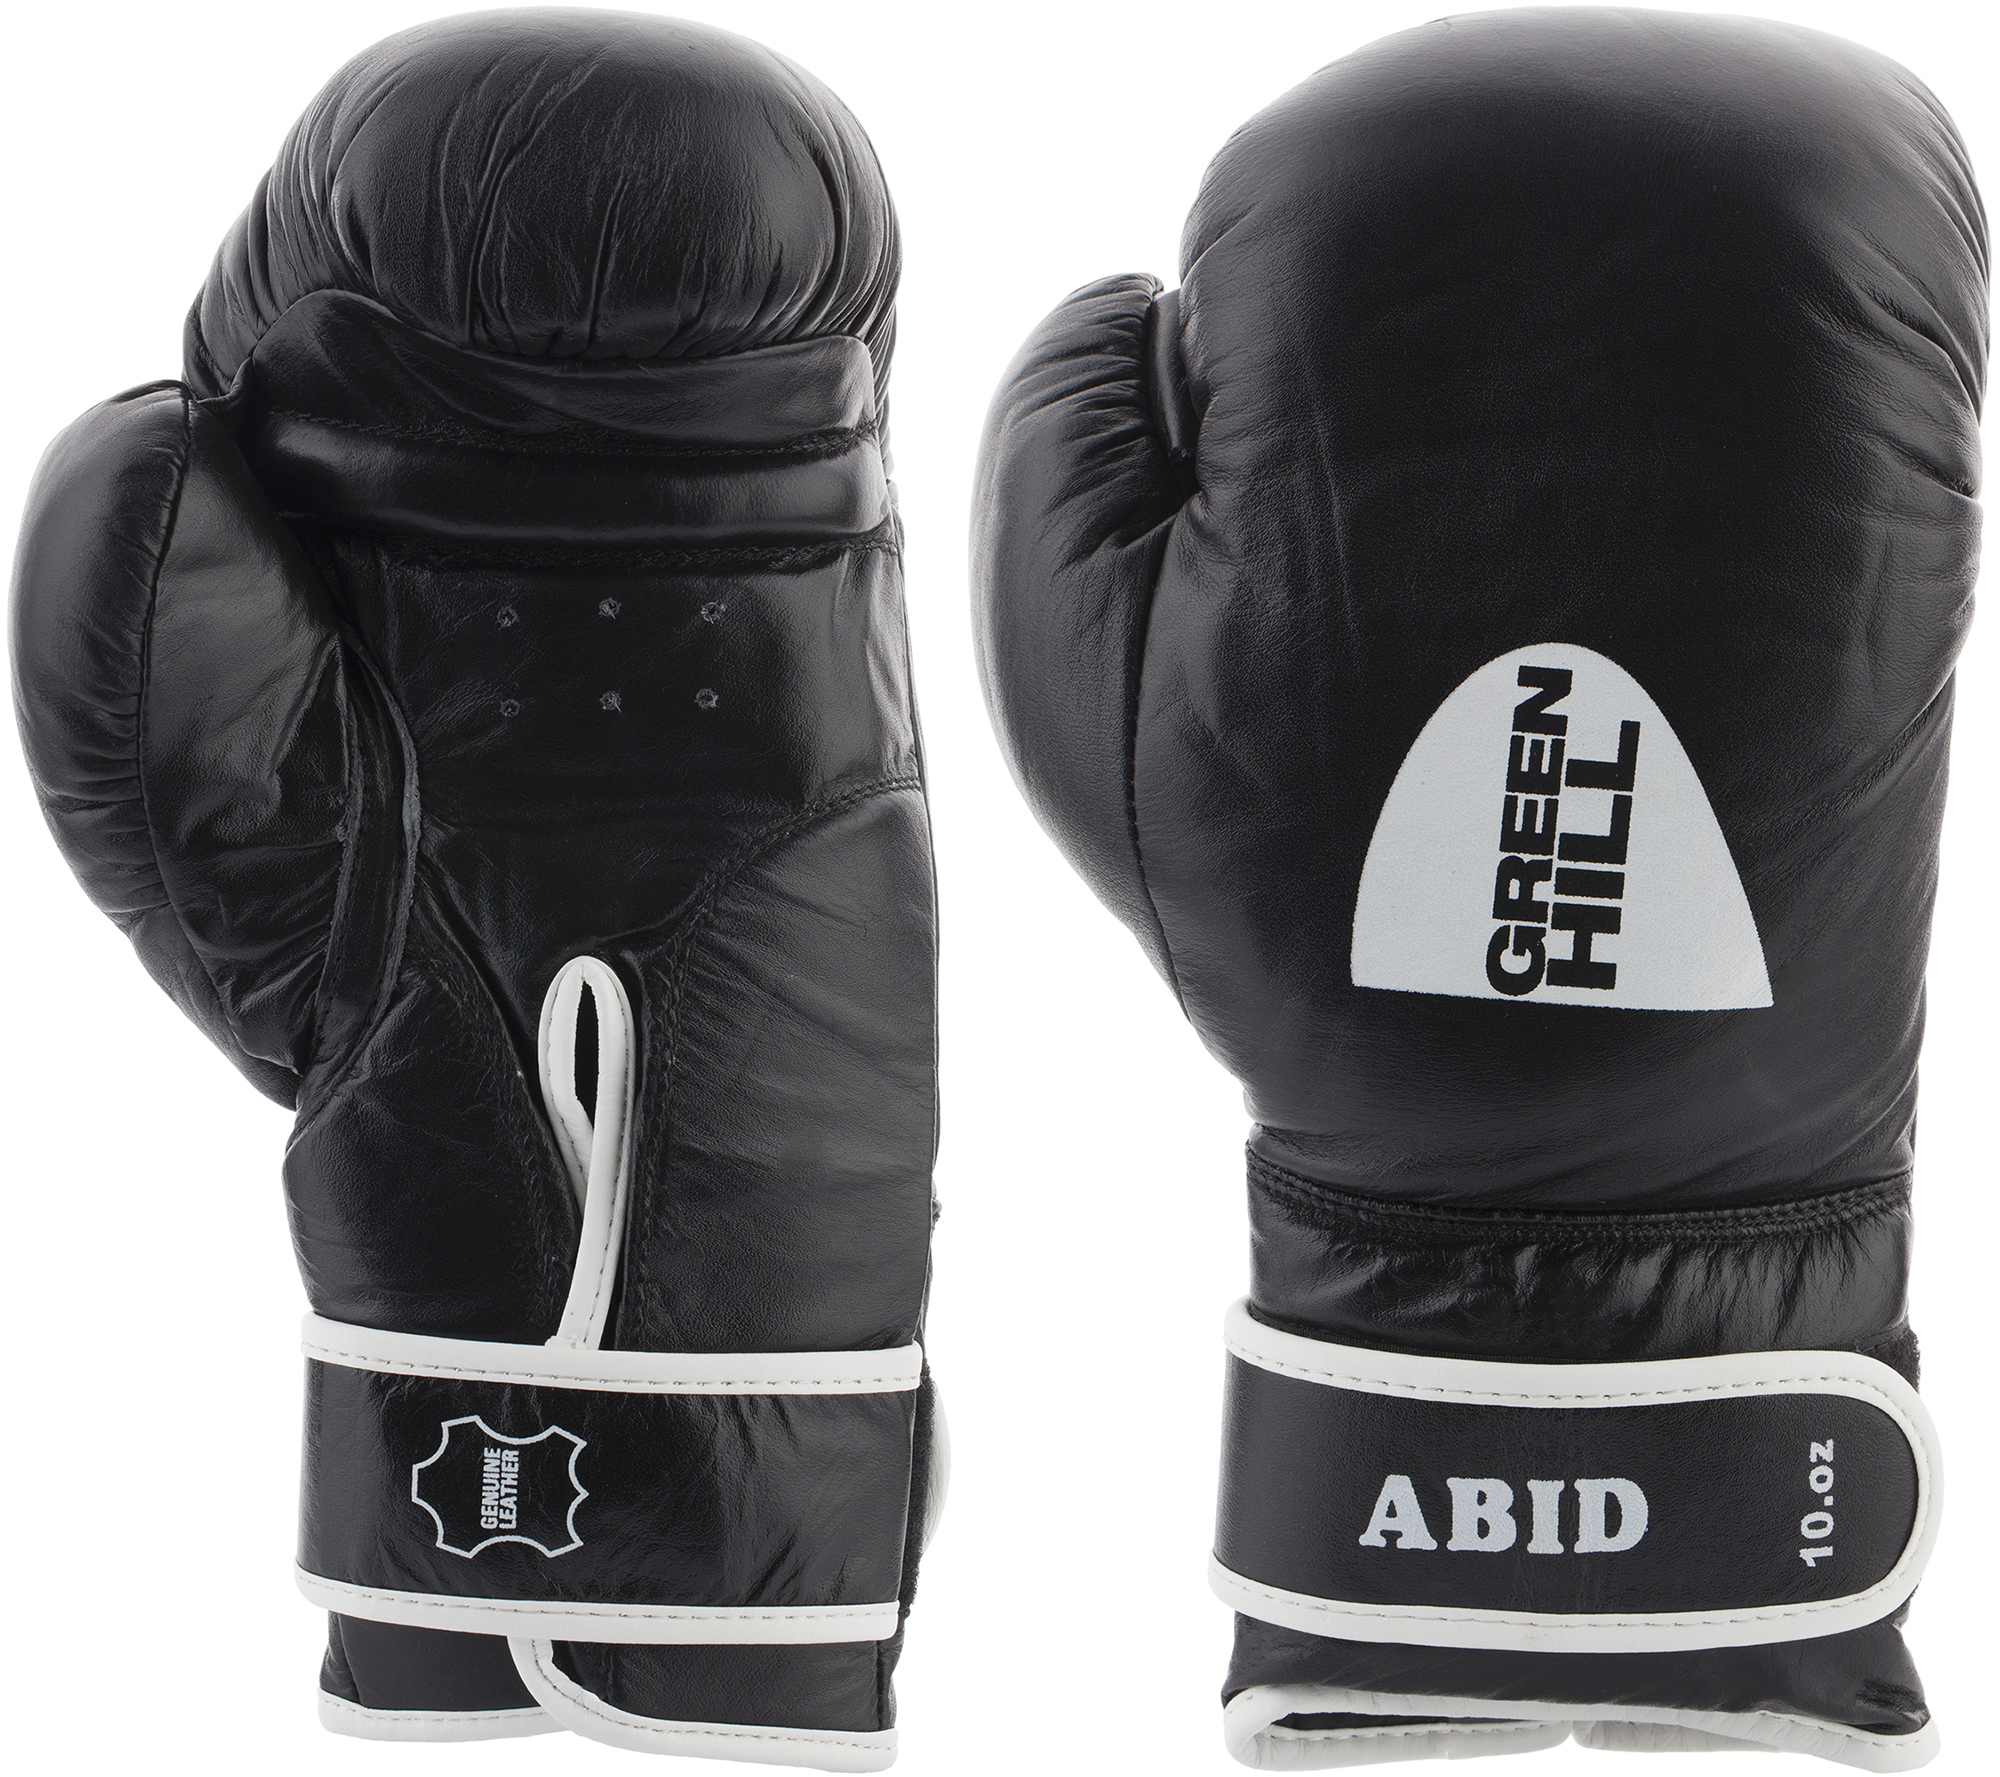 цена на Green Hill Перчатки боксерские Green Hill Abid, размер 10 oz